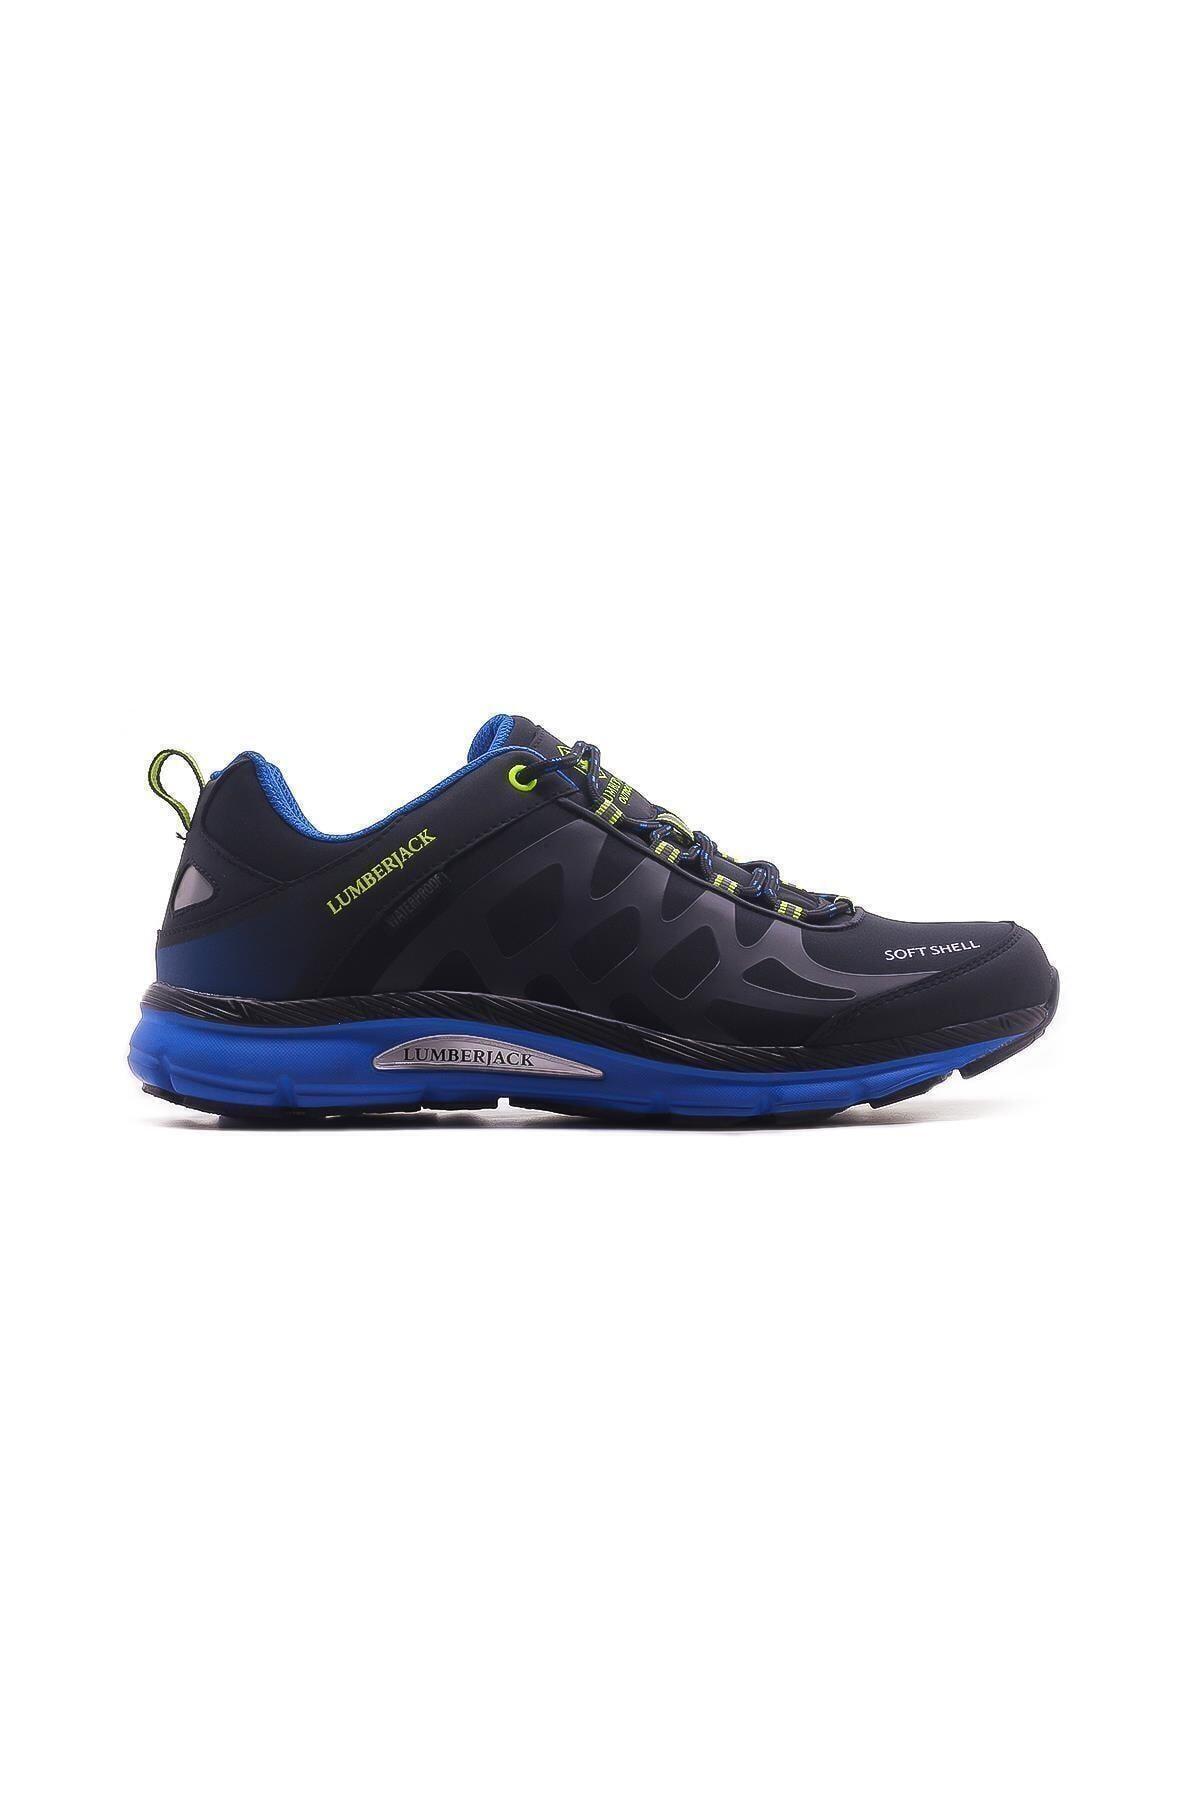 lumberjack Ursa 9pr Erkek Waterproof Ayakkabı 100420726sıyah 1